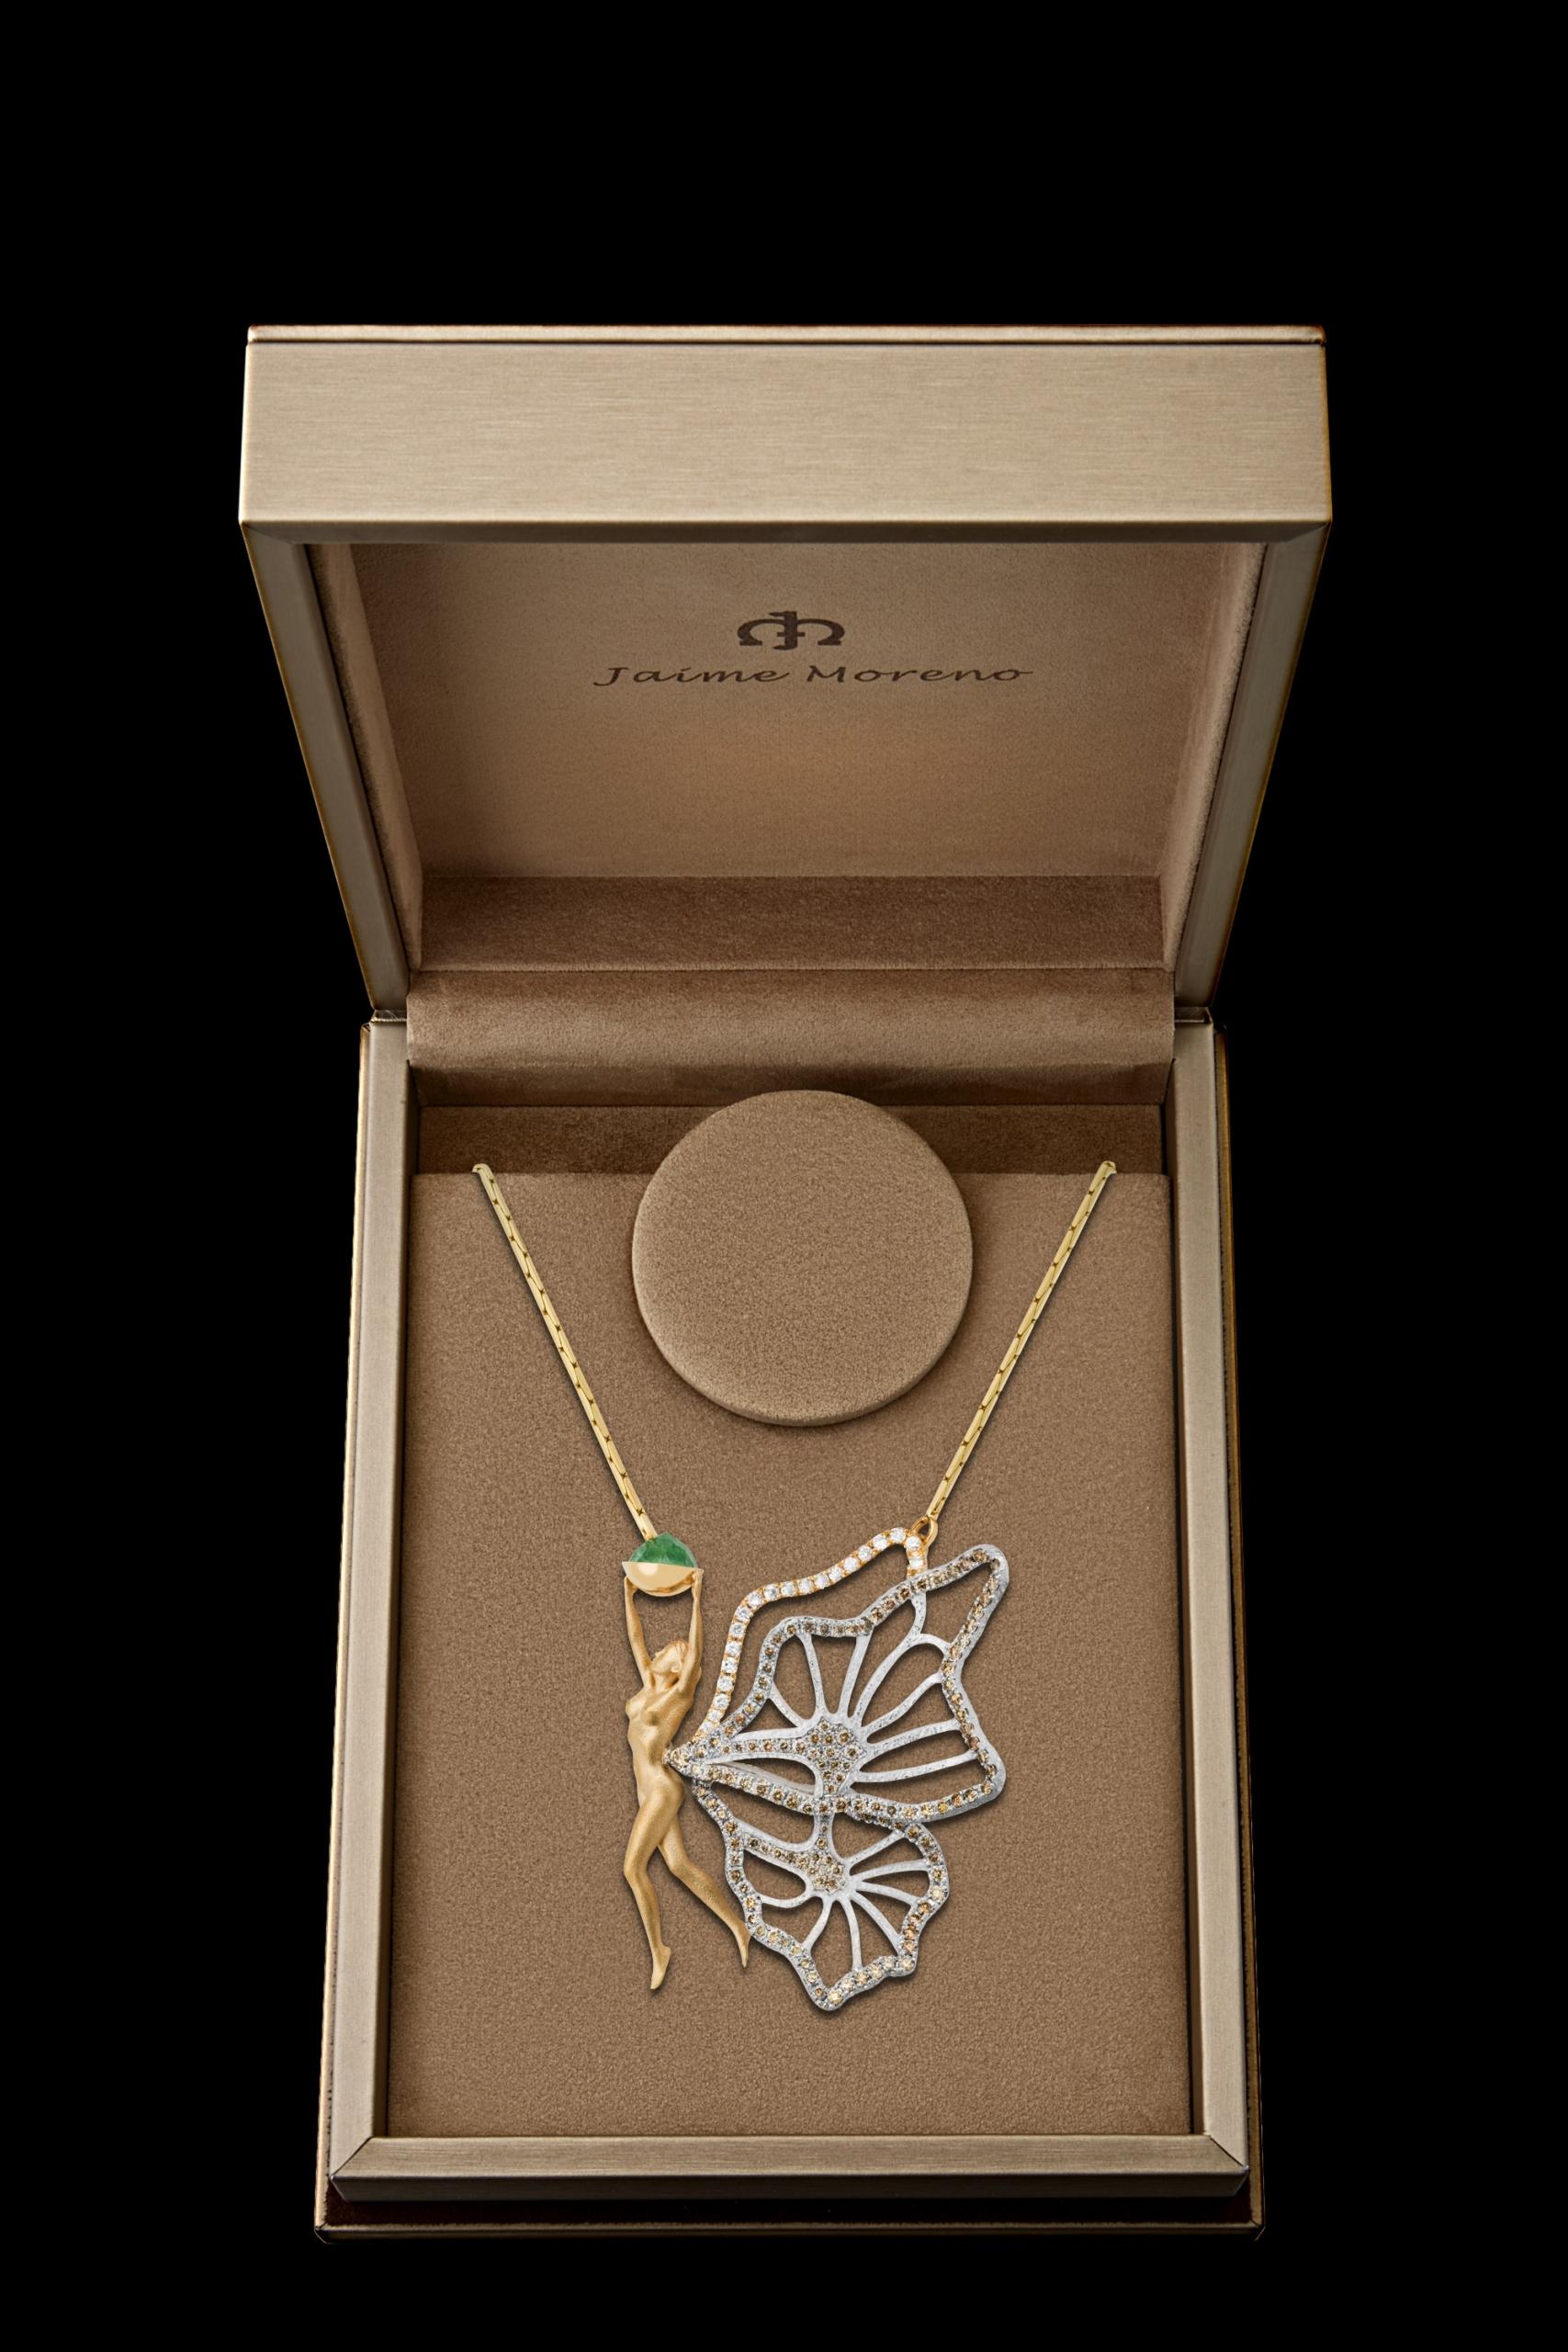 Jaime-Moreno-Art-in-Fine-Jewelry-Femina-Pendant